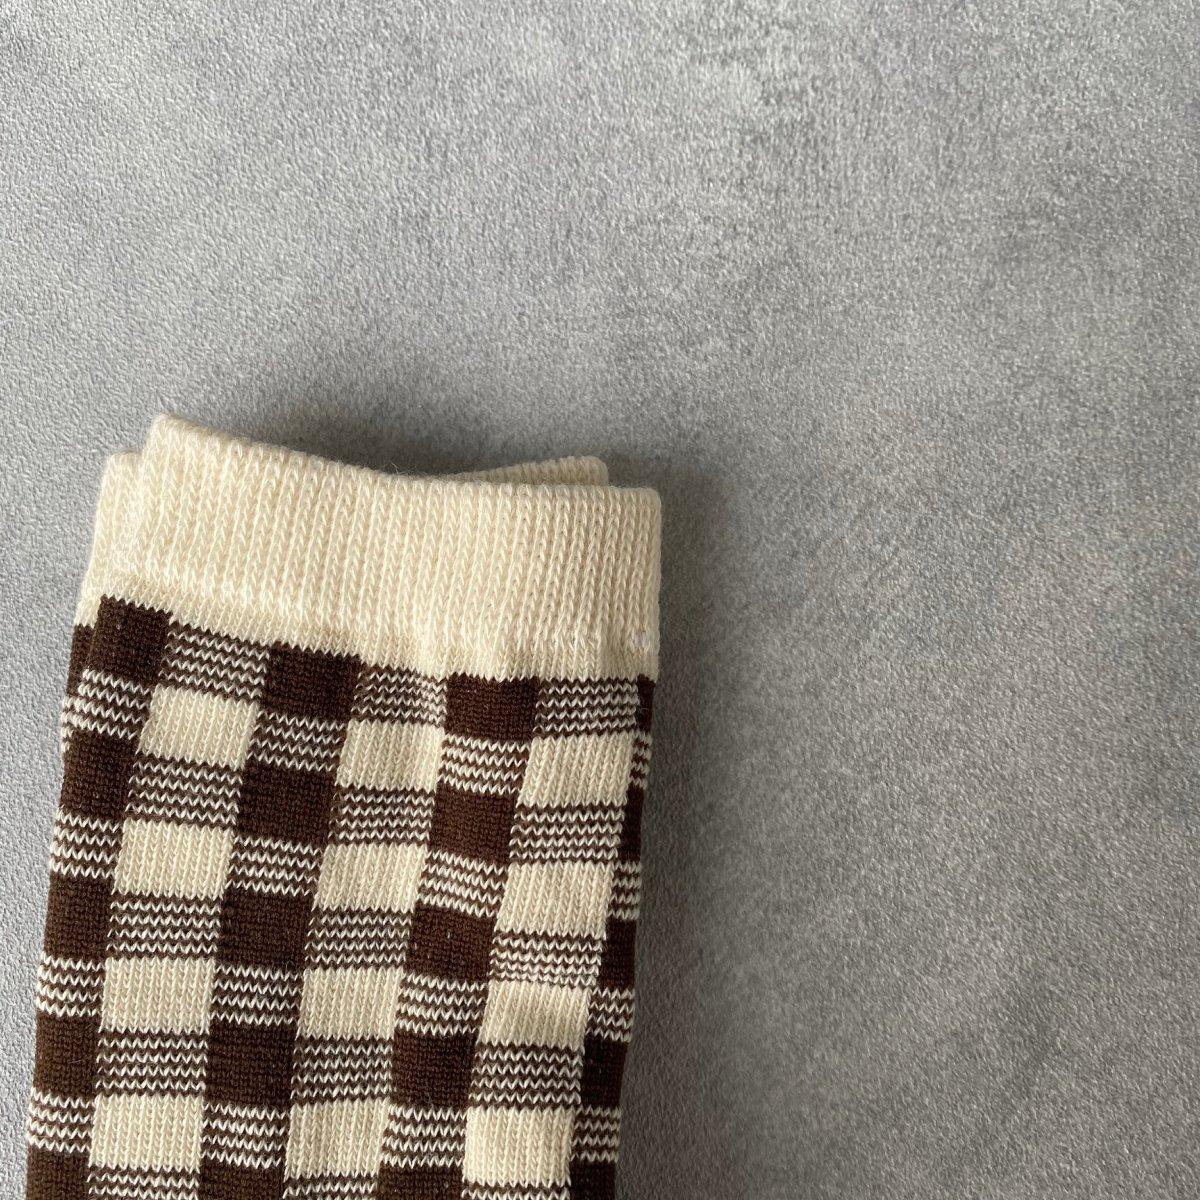 【BABY】Natural Check Socks 詳細画像17